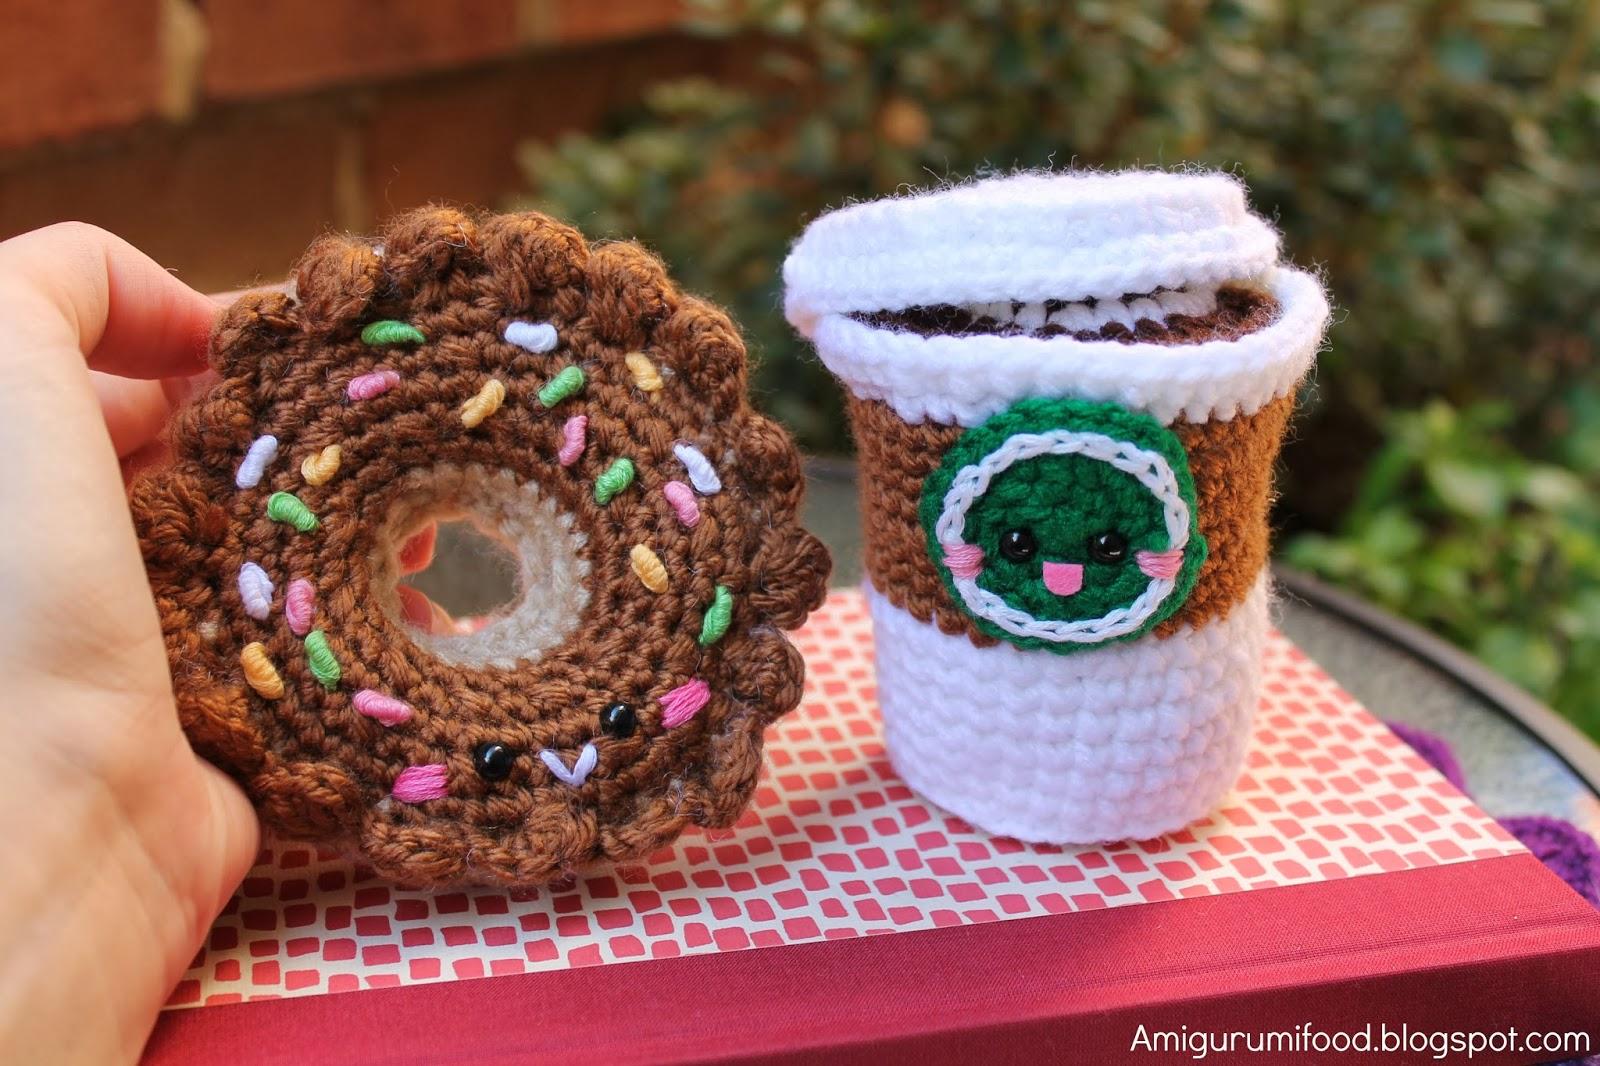 Amigurumi Crochet Food Patterns : Amigurumi Food: New update Donut Amigurumi!!